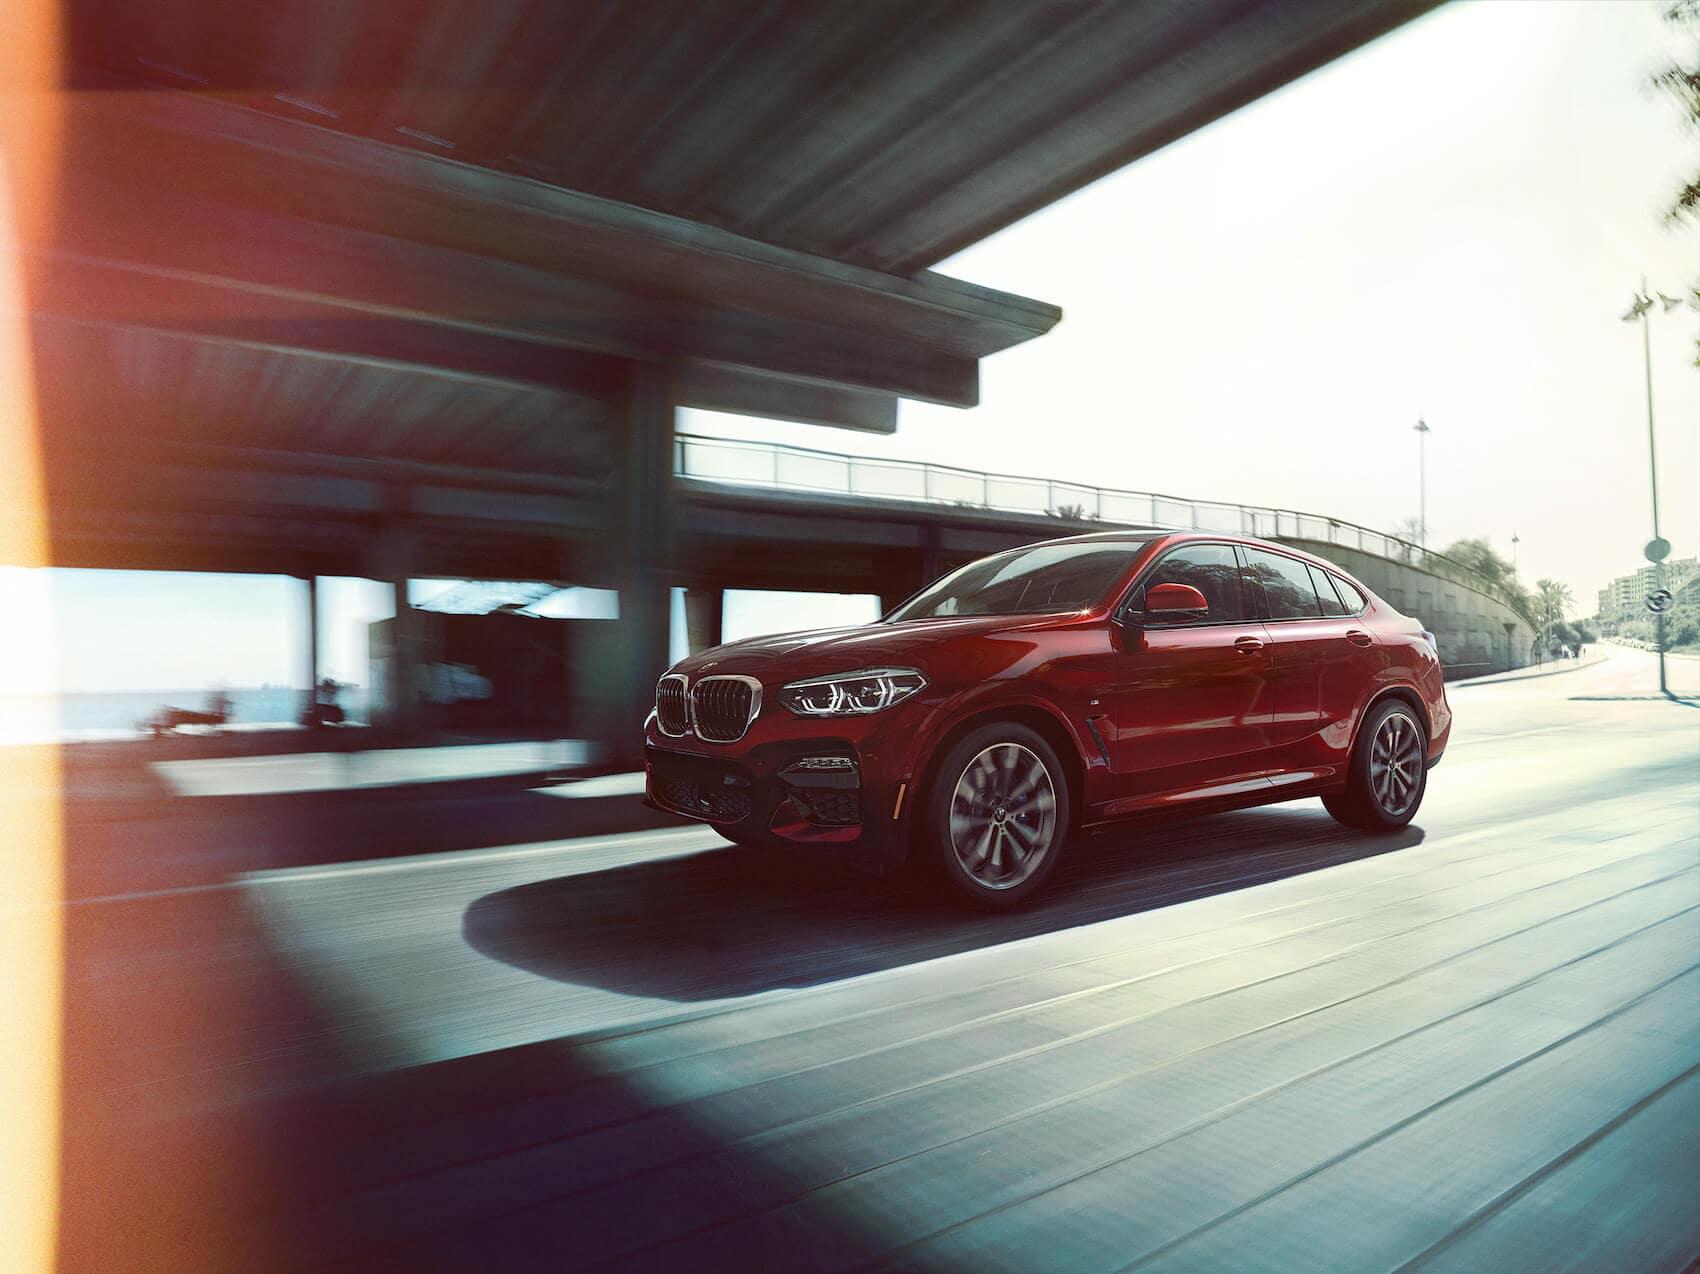 BMW X4 Technology